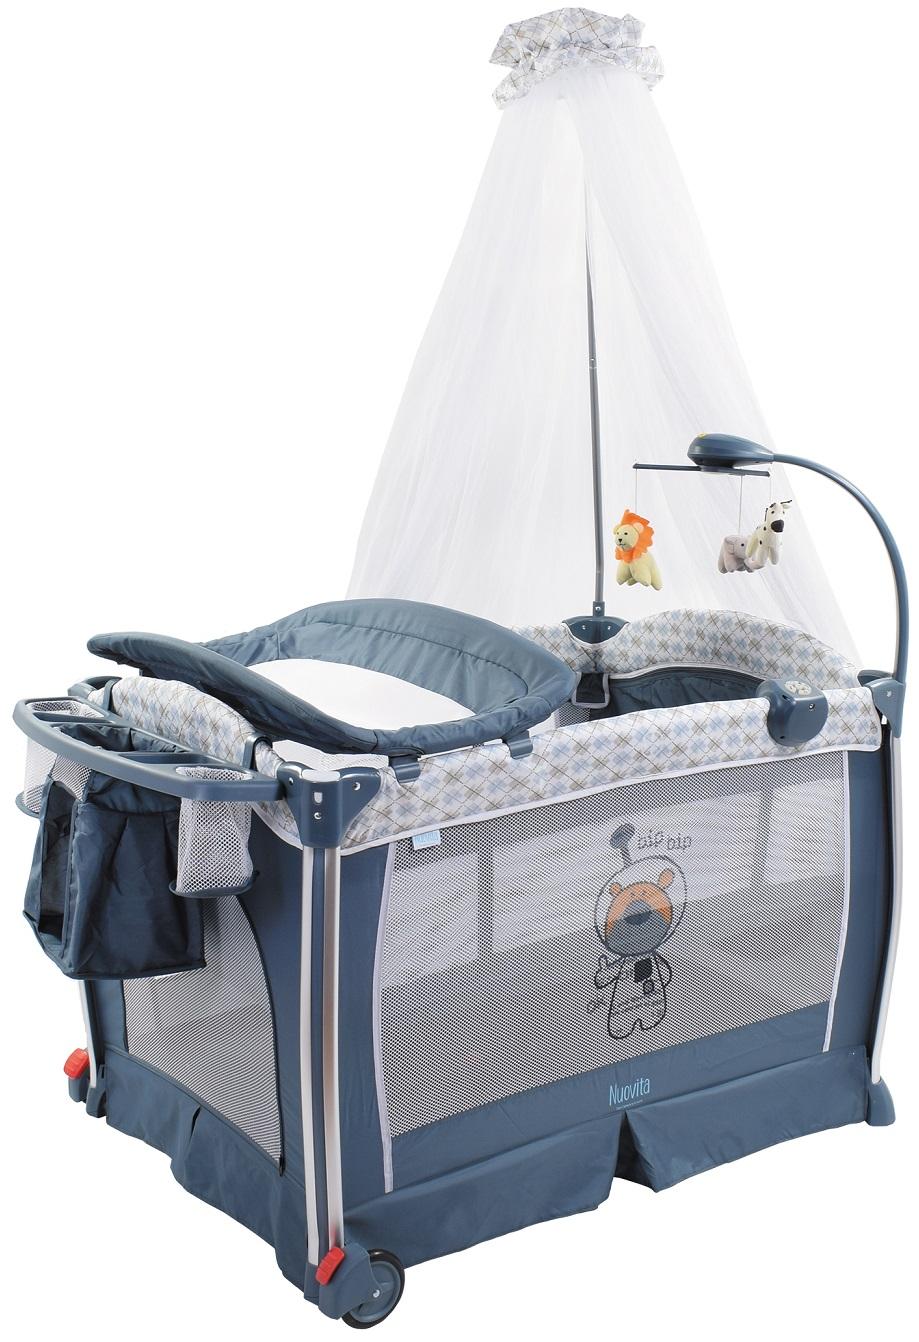 Детская кровать-манеж Nuovita Fortezza, цвет - Grigio scuro / Темно-серый